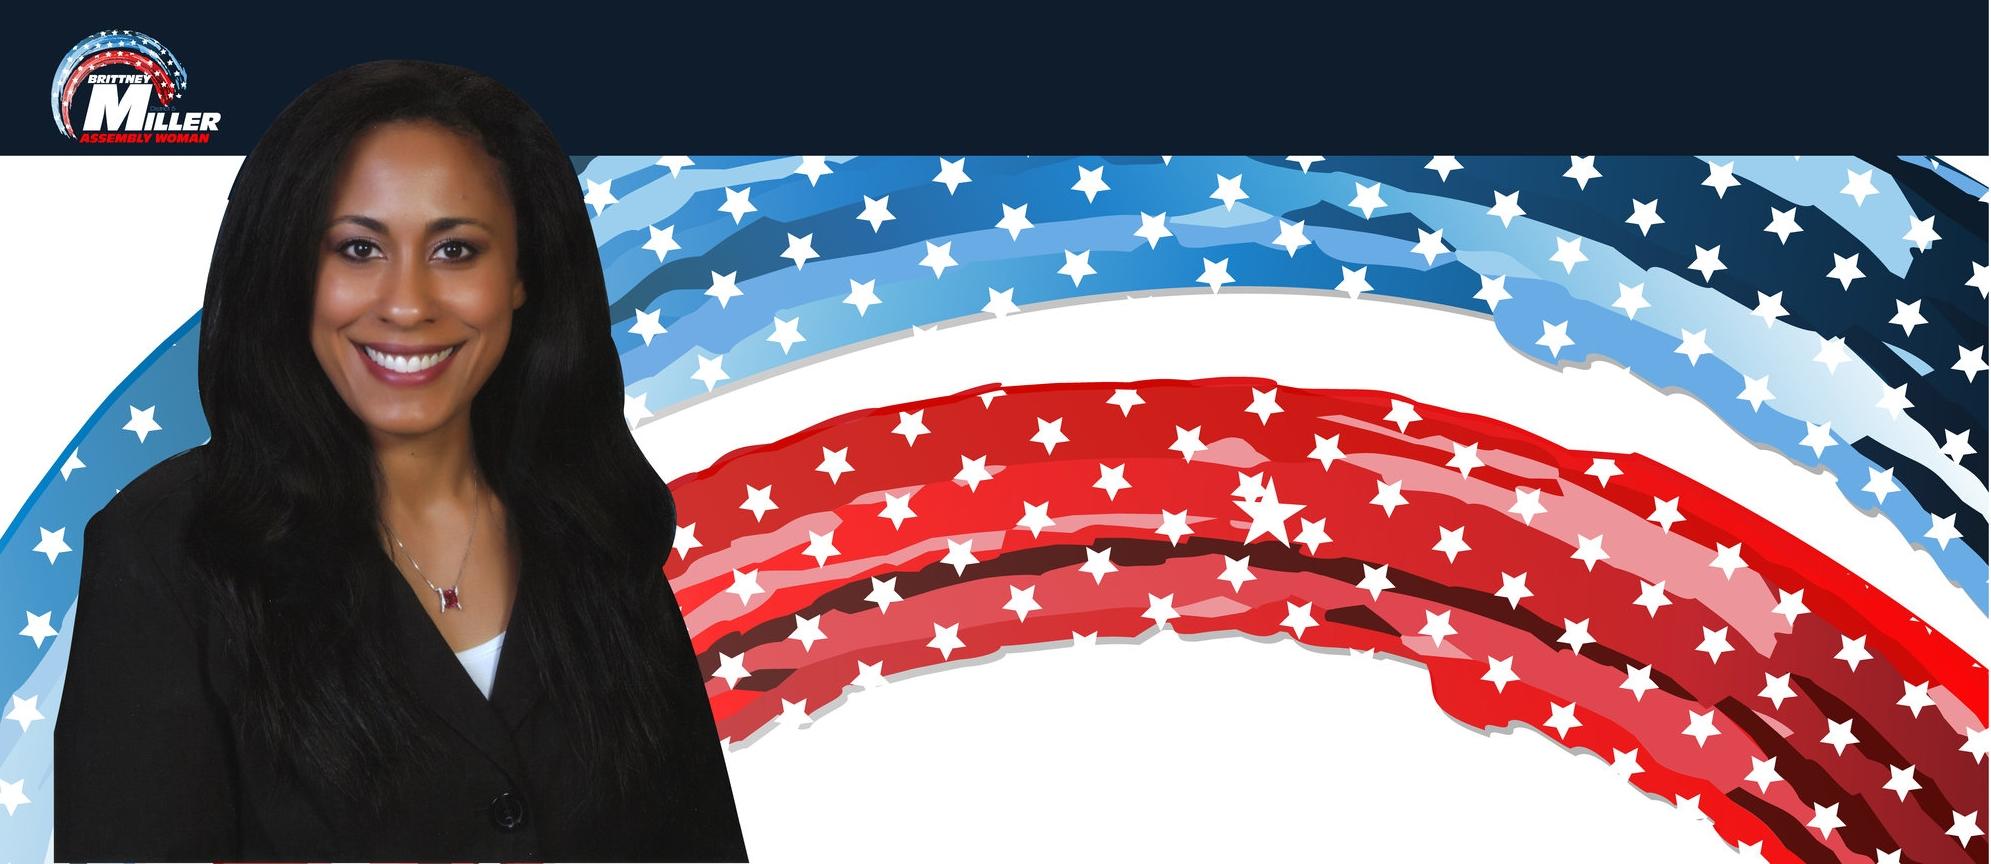 Brittney-Miller-Web-Banner3.jpg